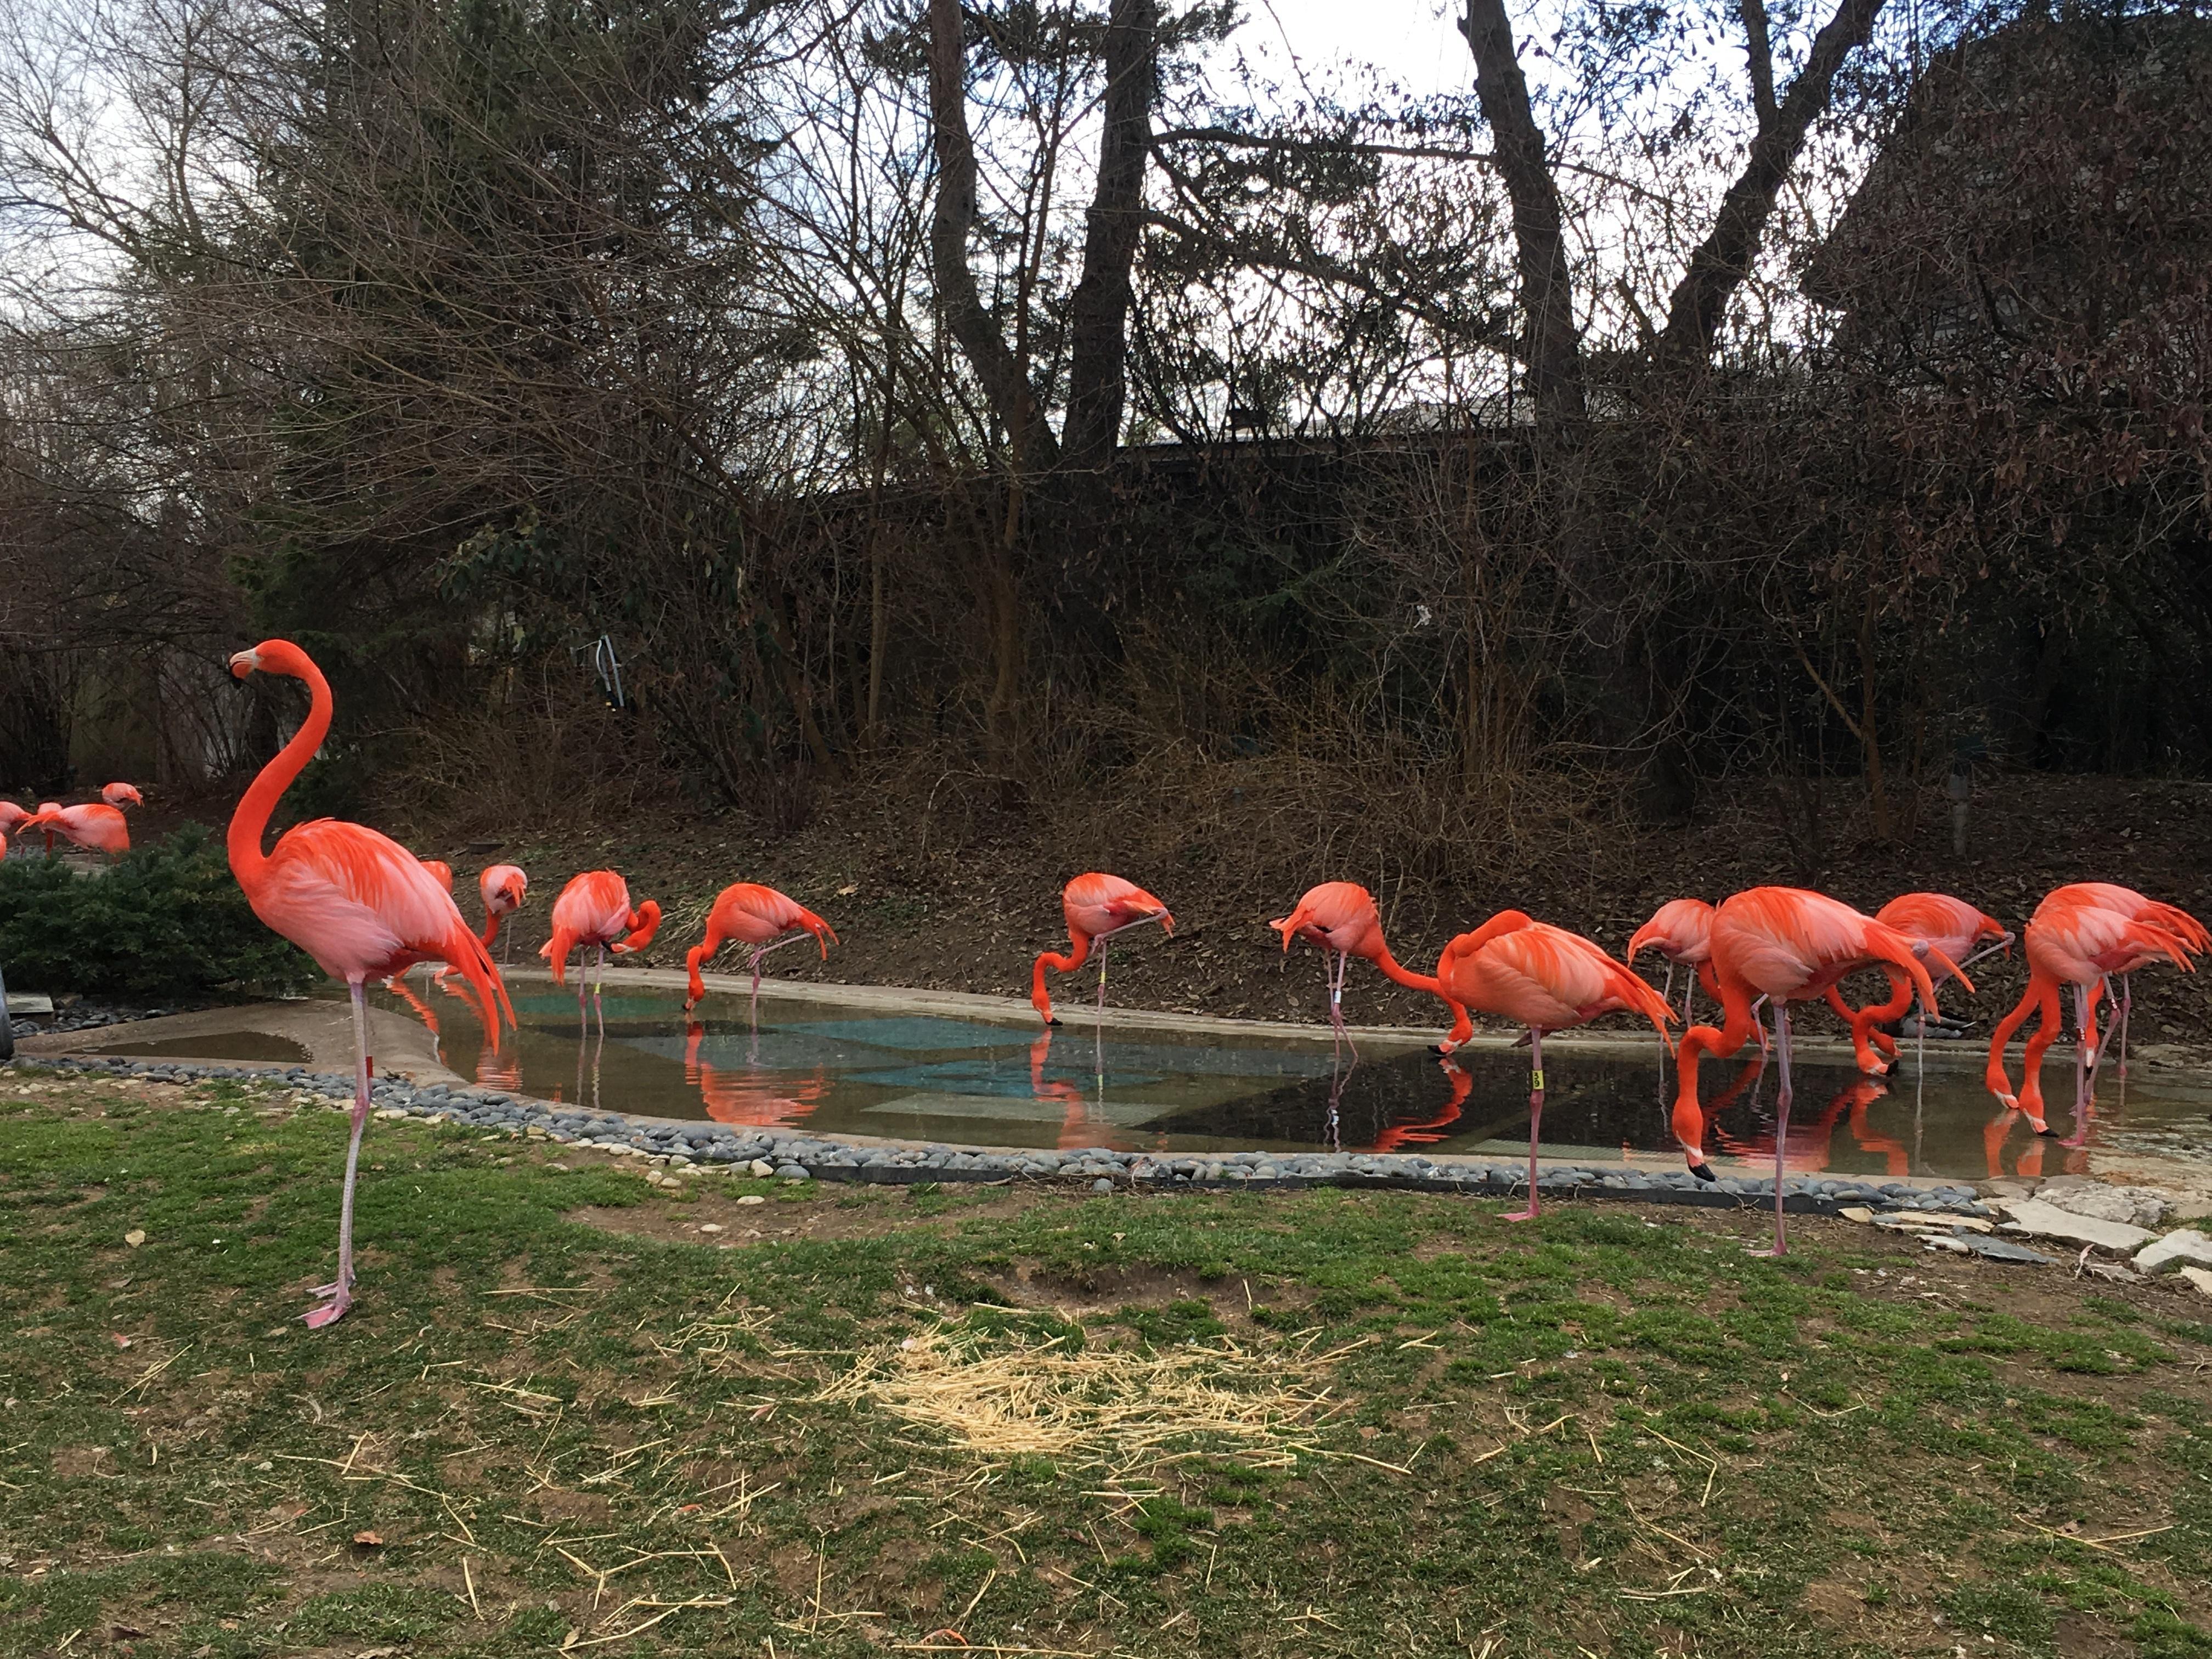 Cheap Gas Columbus Ohio >> Columbus Zoo Seasonal Job Fair and Open Interviews